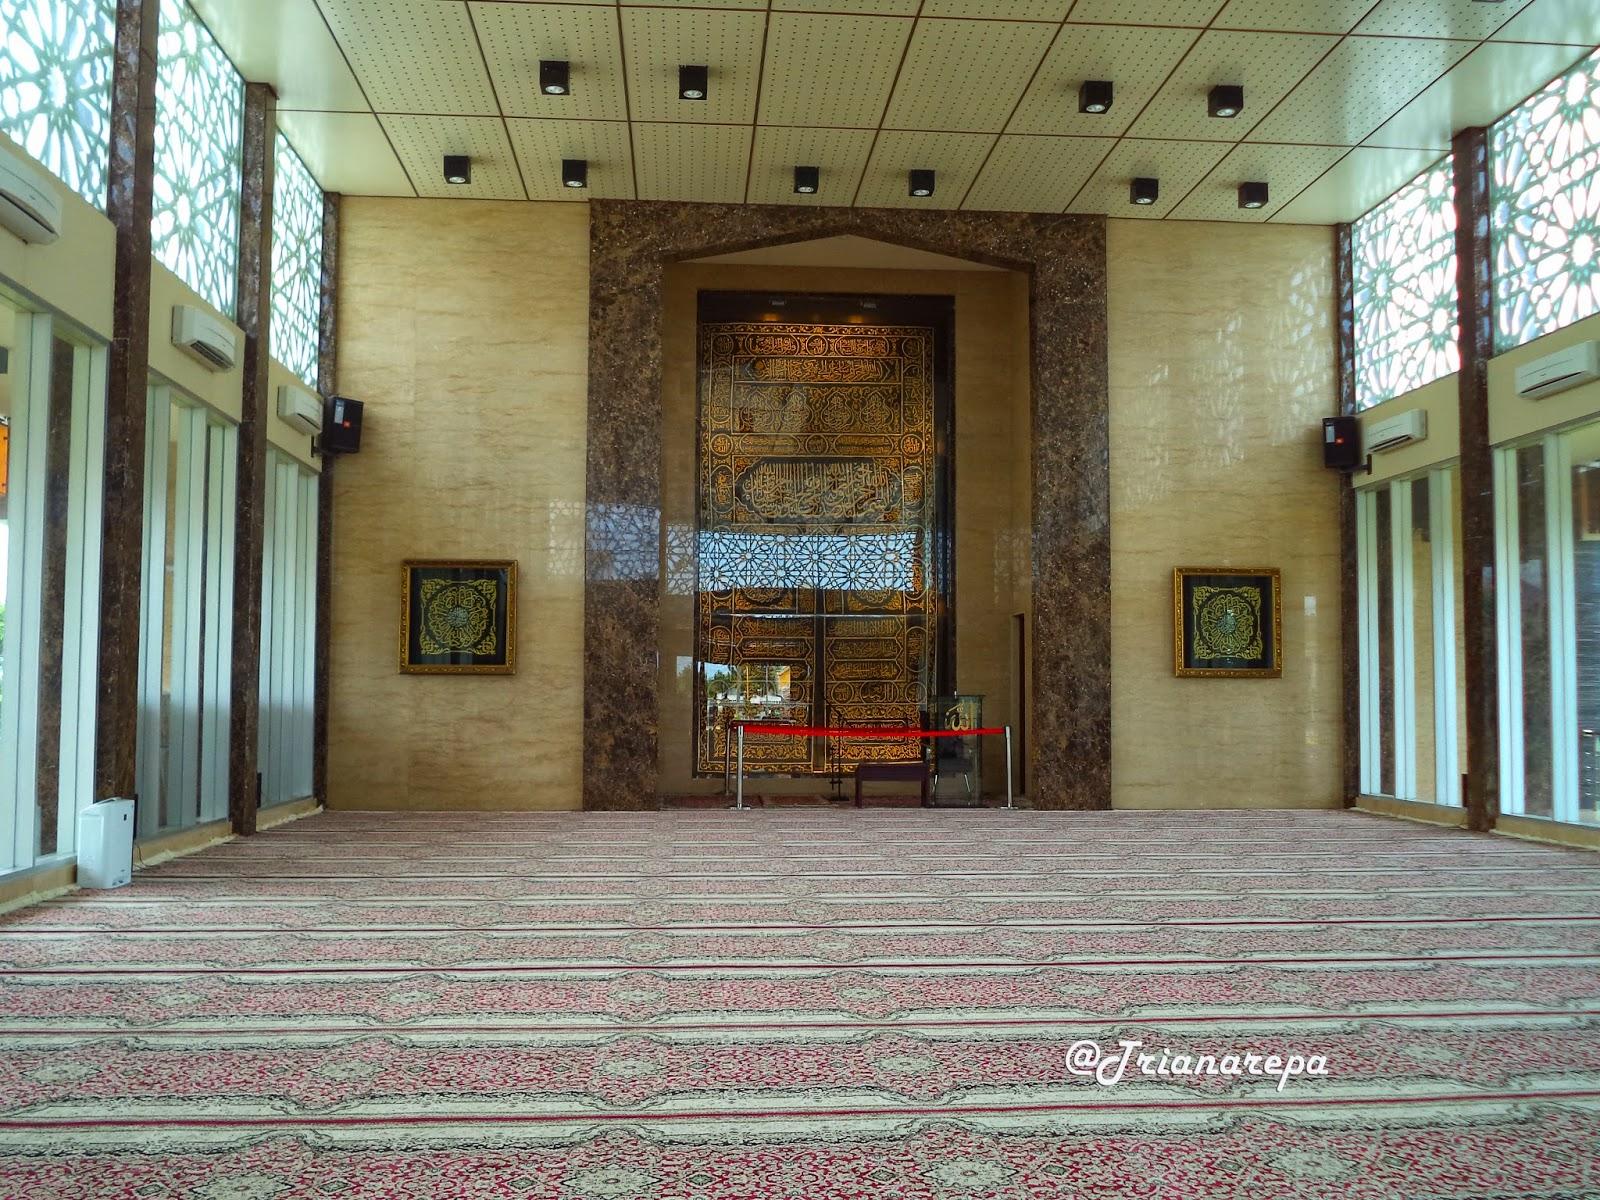 Indahnya Masjid Namira Lamongan Pejalan Memasuki Bagian Kita Disambut Dinginya